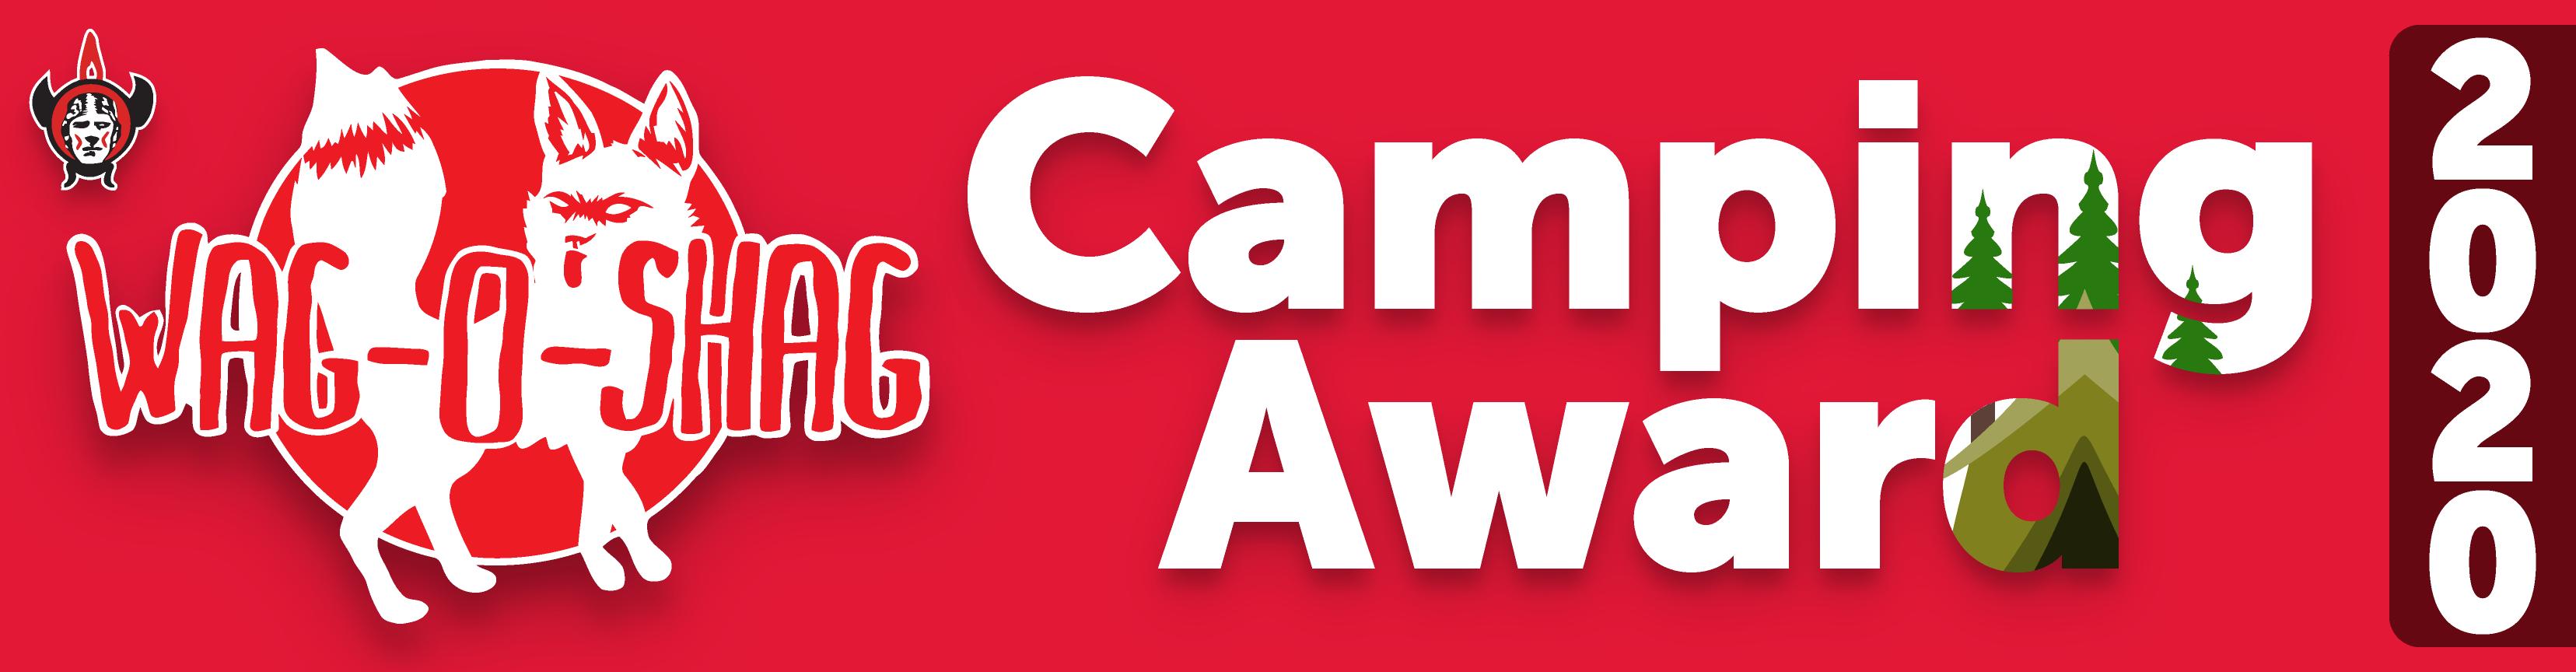 Camping Award Bumper Sticker (1)